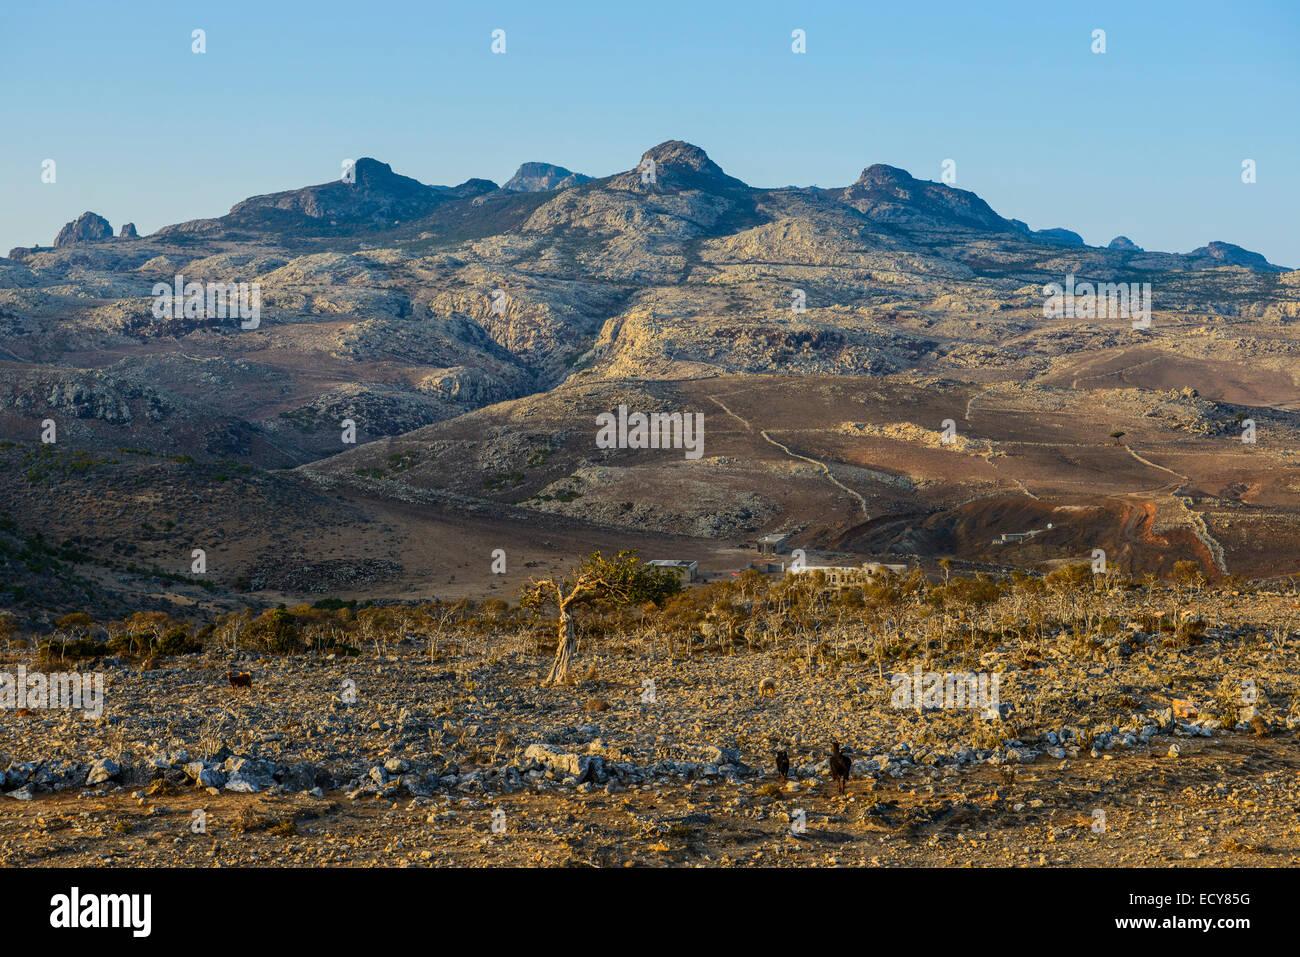 Giant rock mountains at the Dixsam plateau, Socotra, Yemen - Stock Image